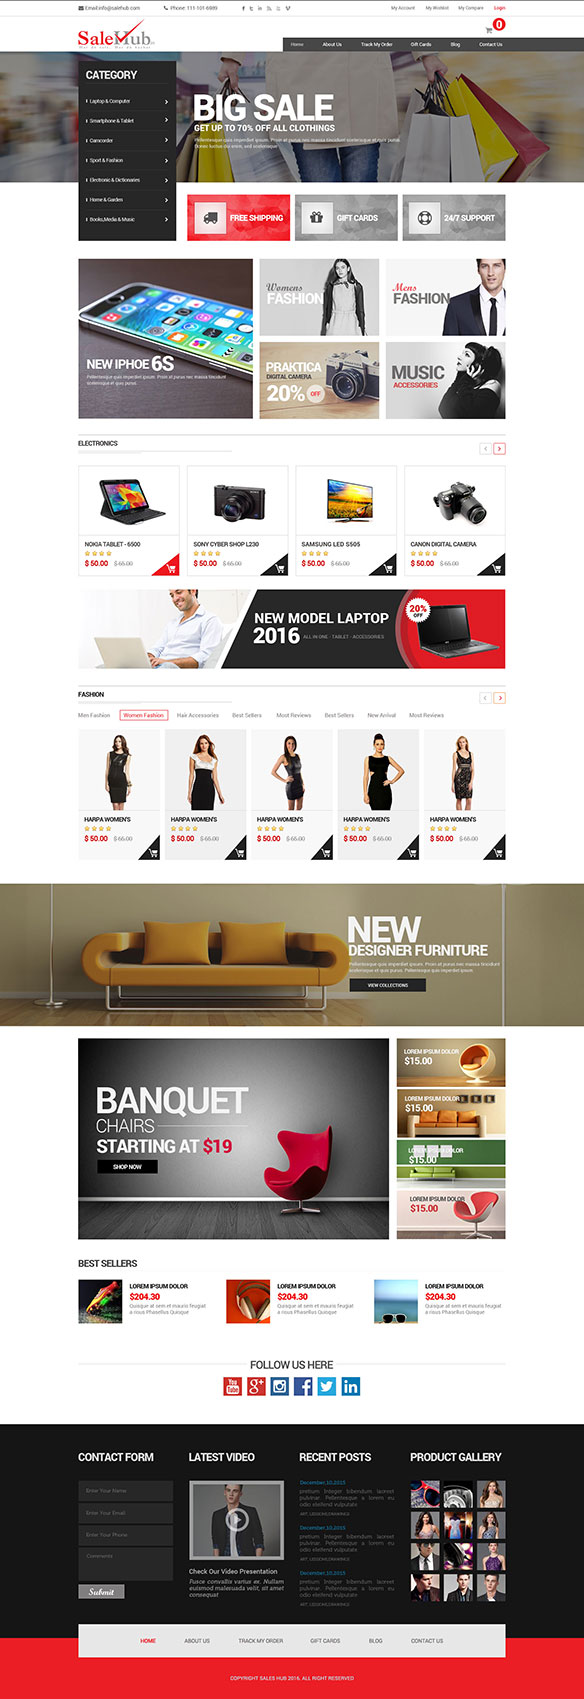 Web Design Portfolio 18 - DreamLogoDesign